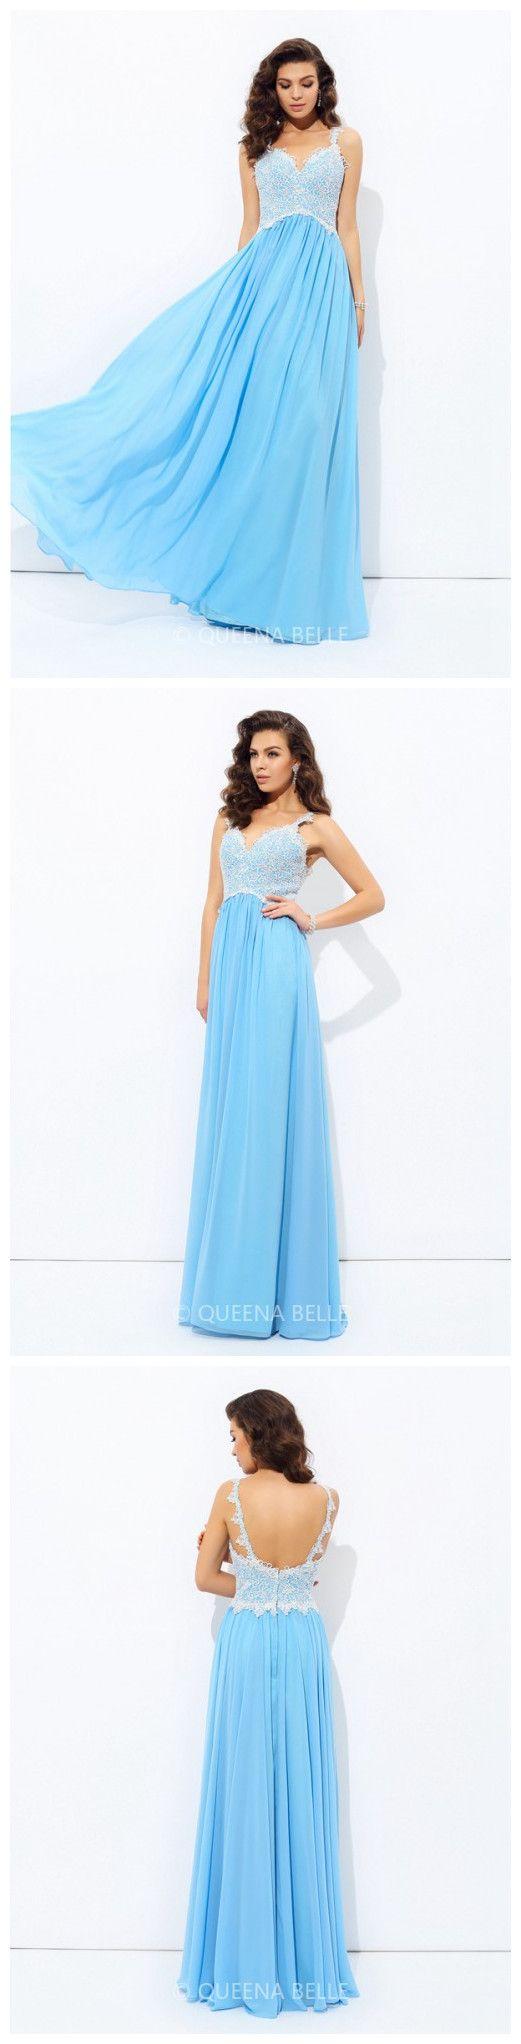 119 best Prom Dresses images on Pinterest | Evening dresses ...